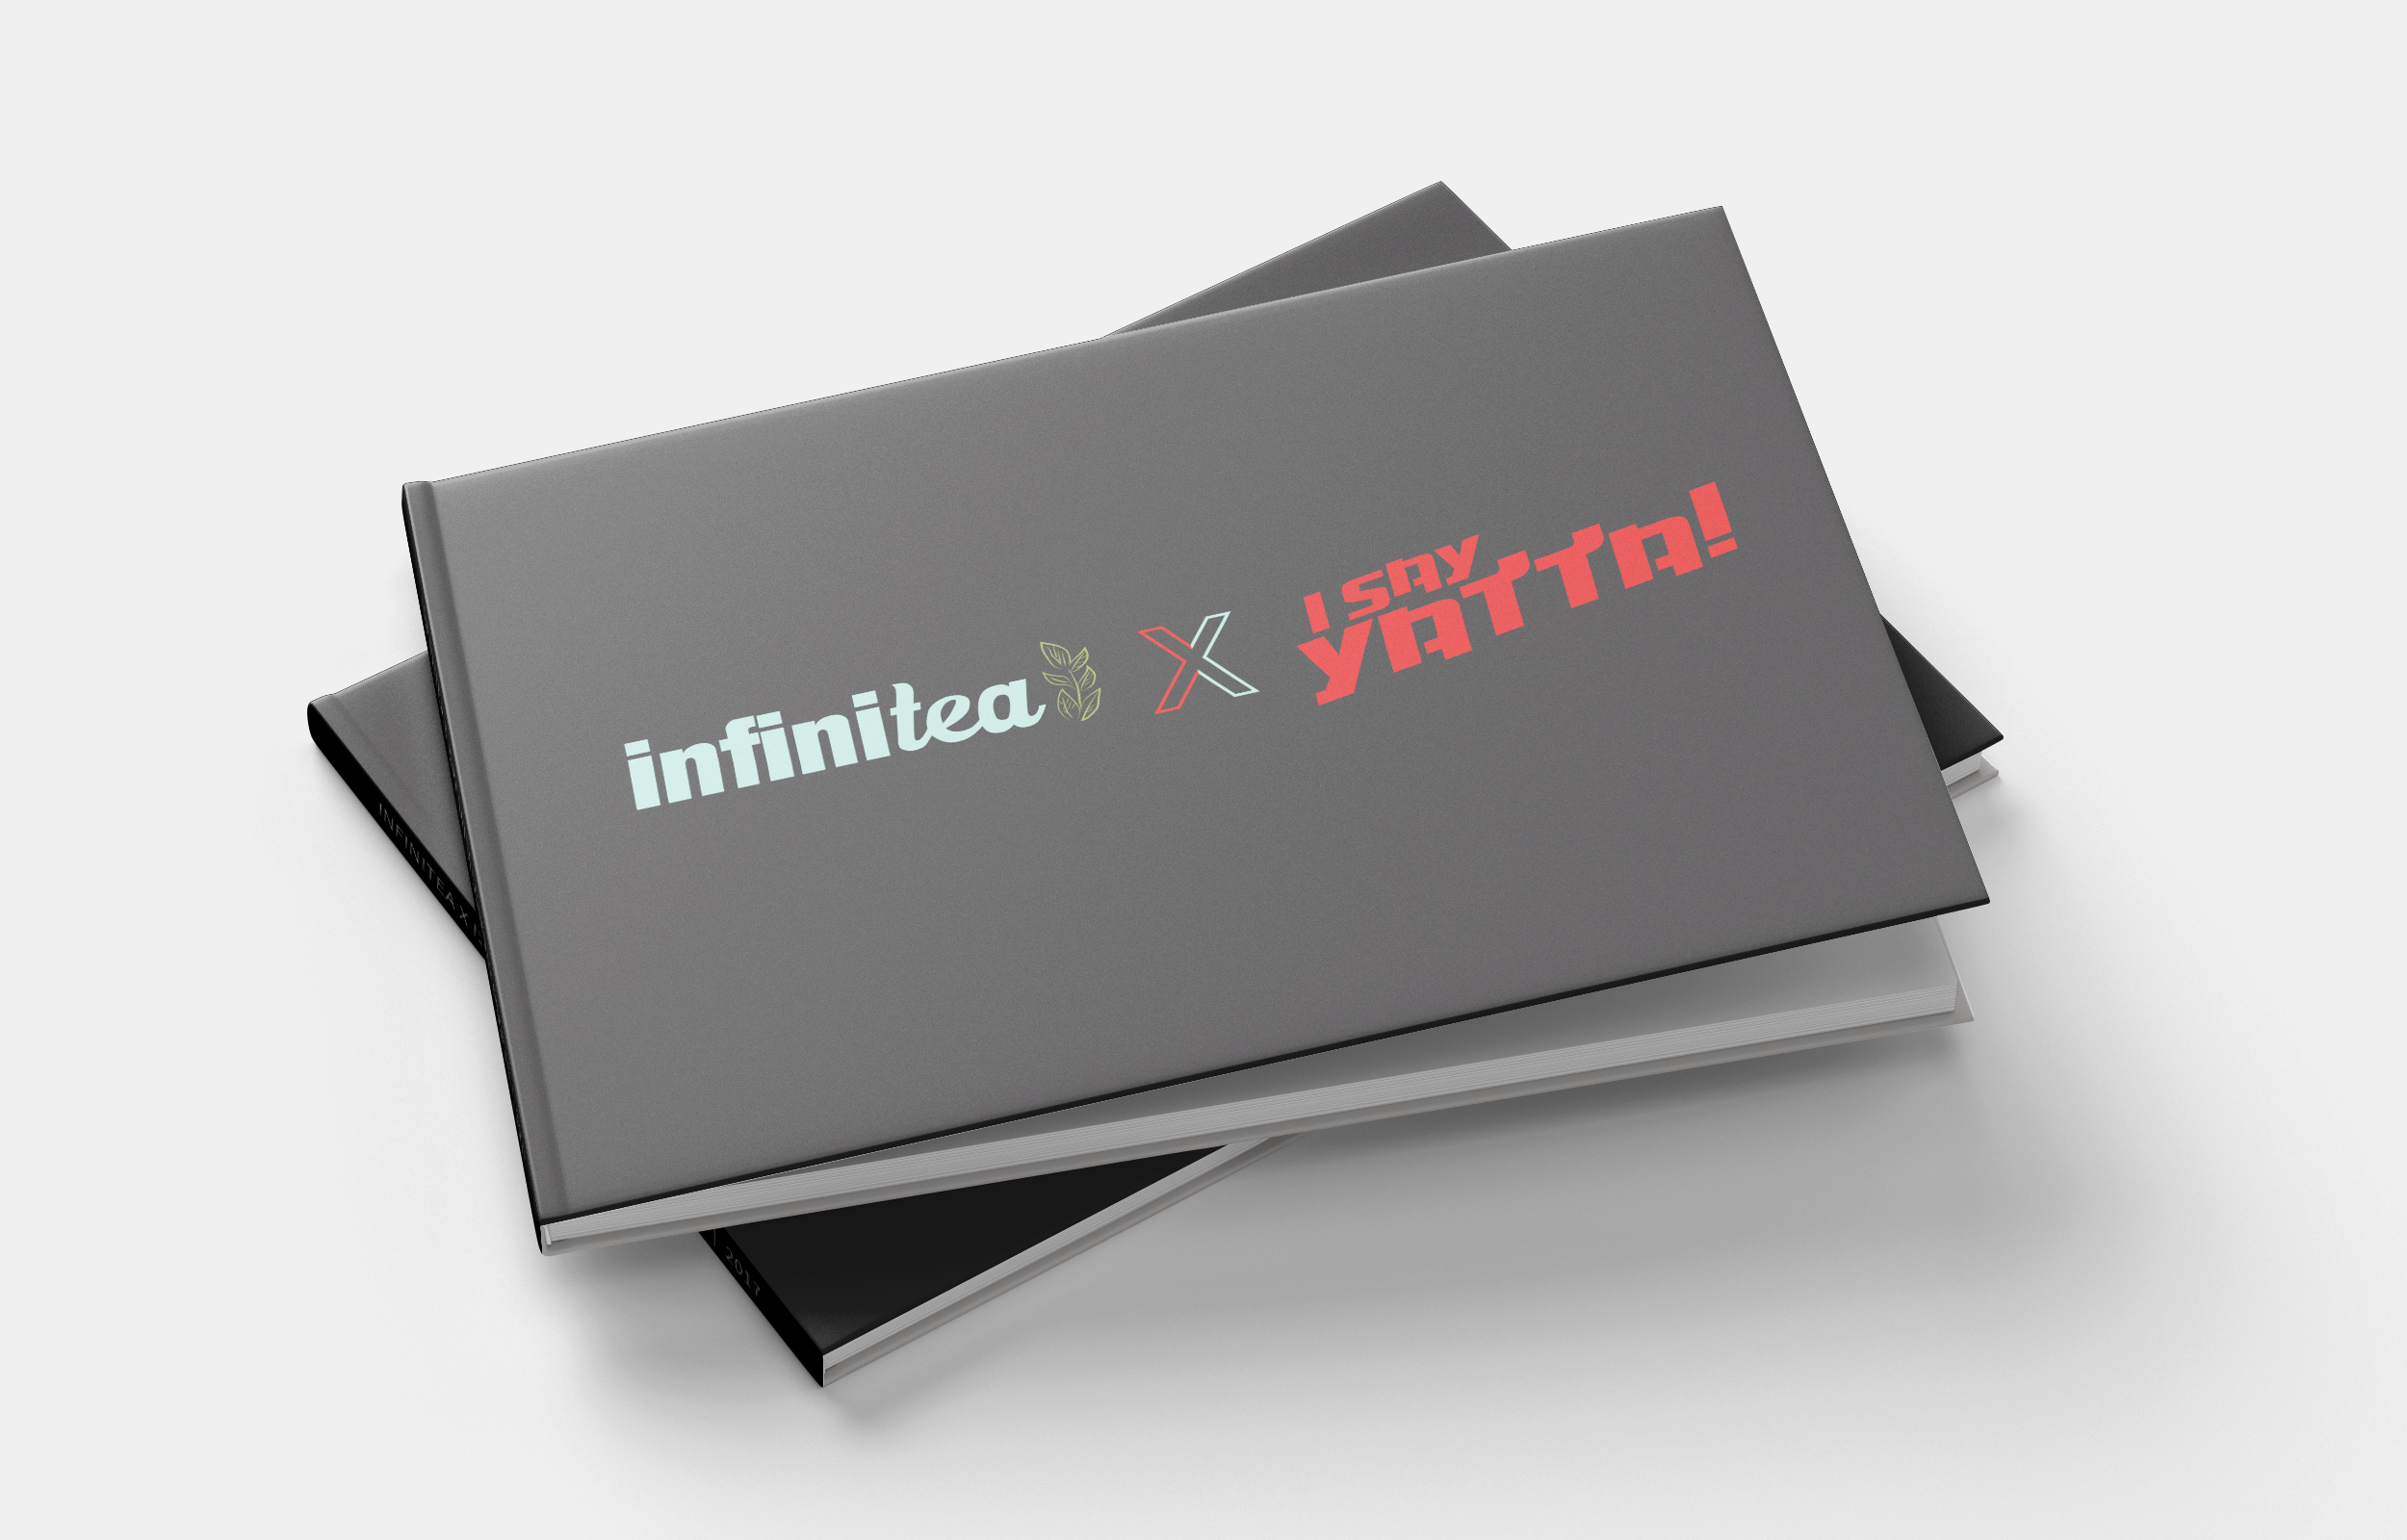 INFINITEA x I SAY YATTA   Print/publication design